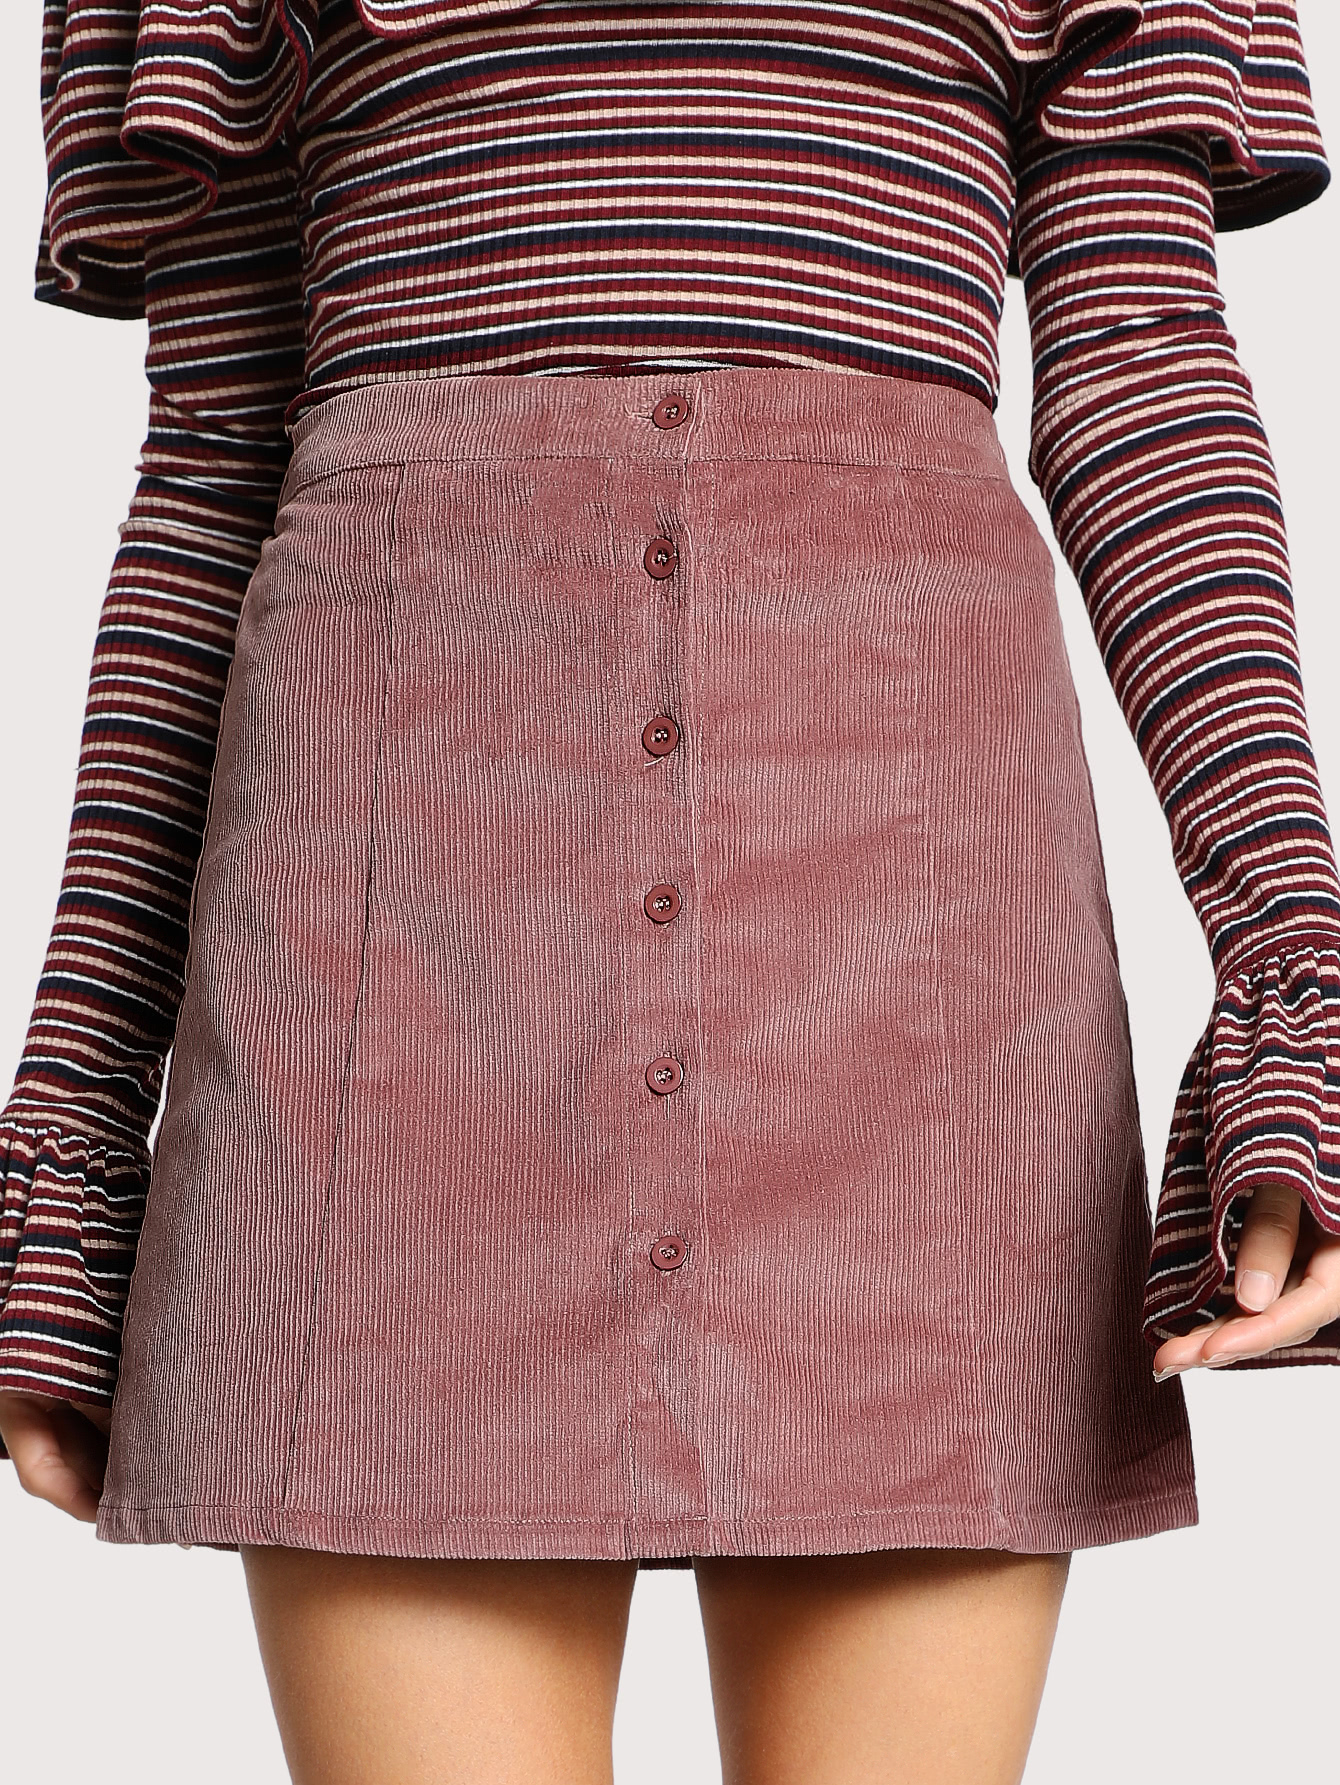 Button Down Cord Skirt